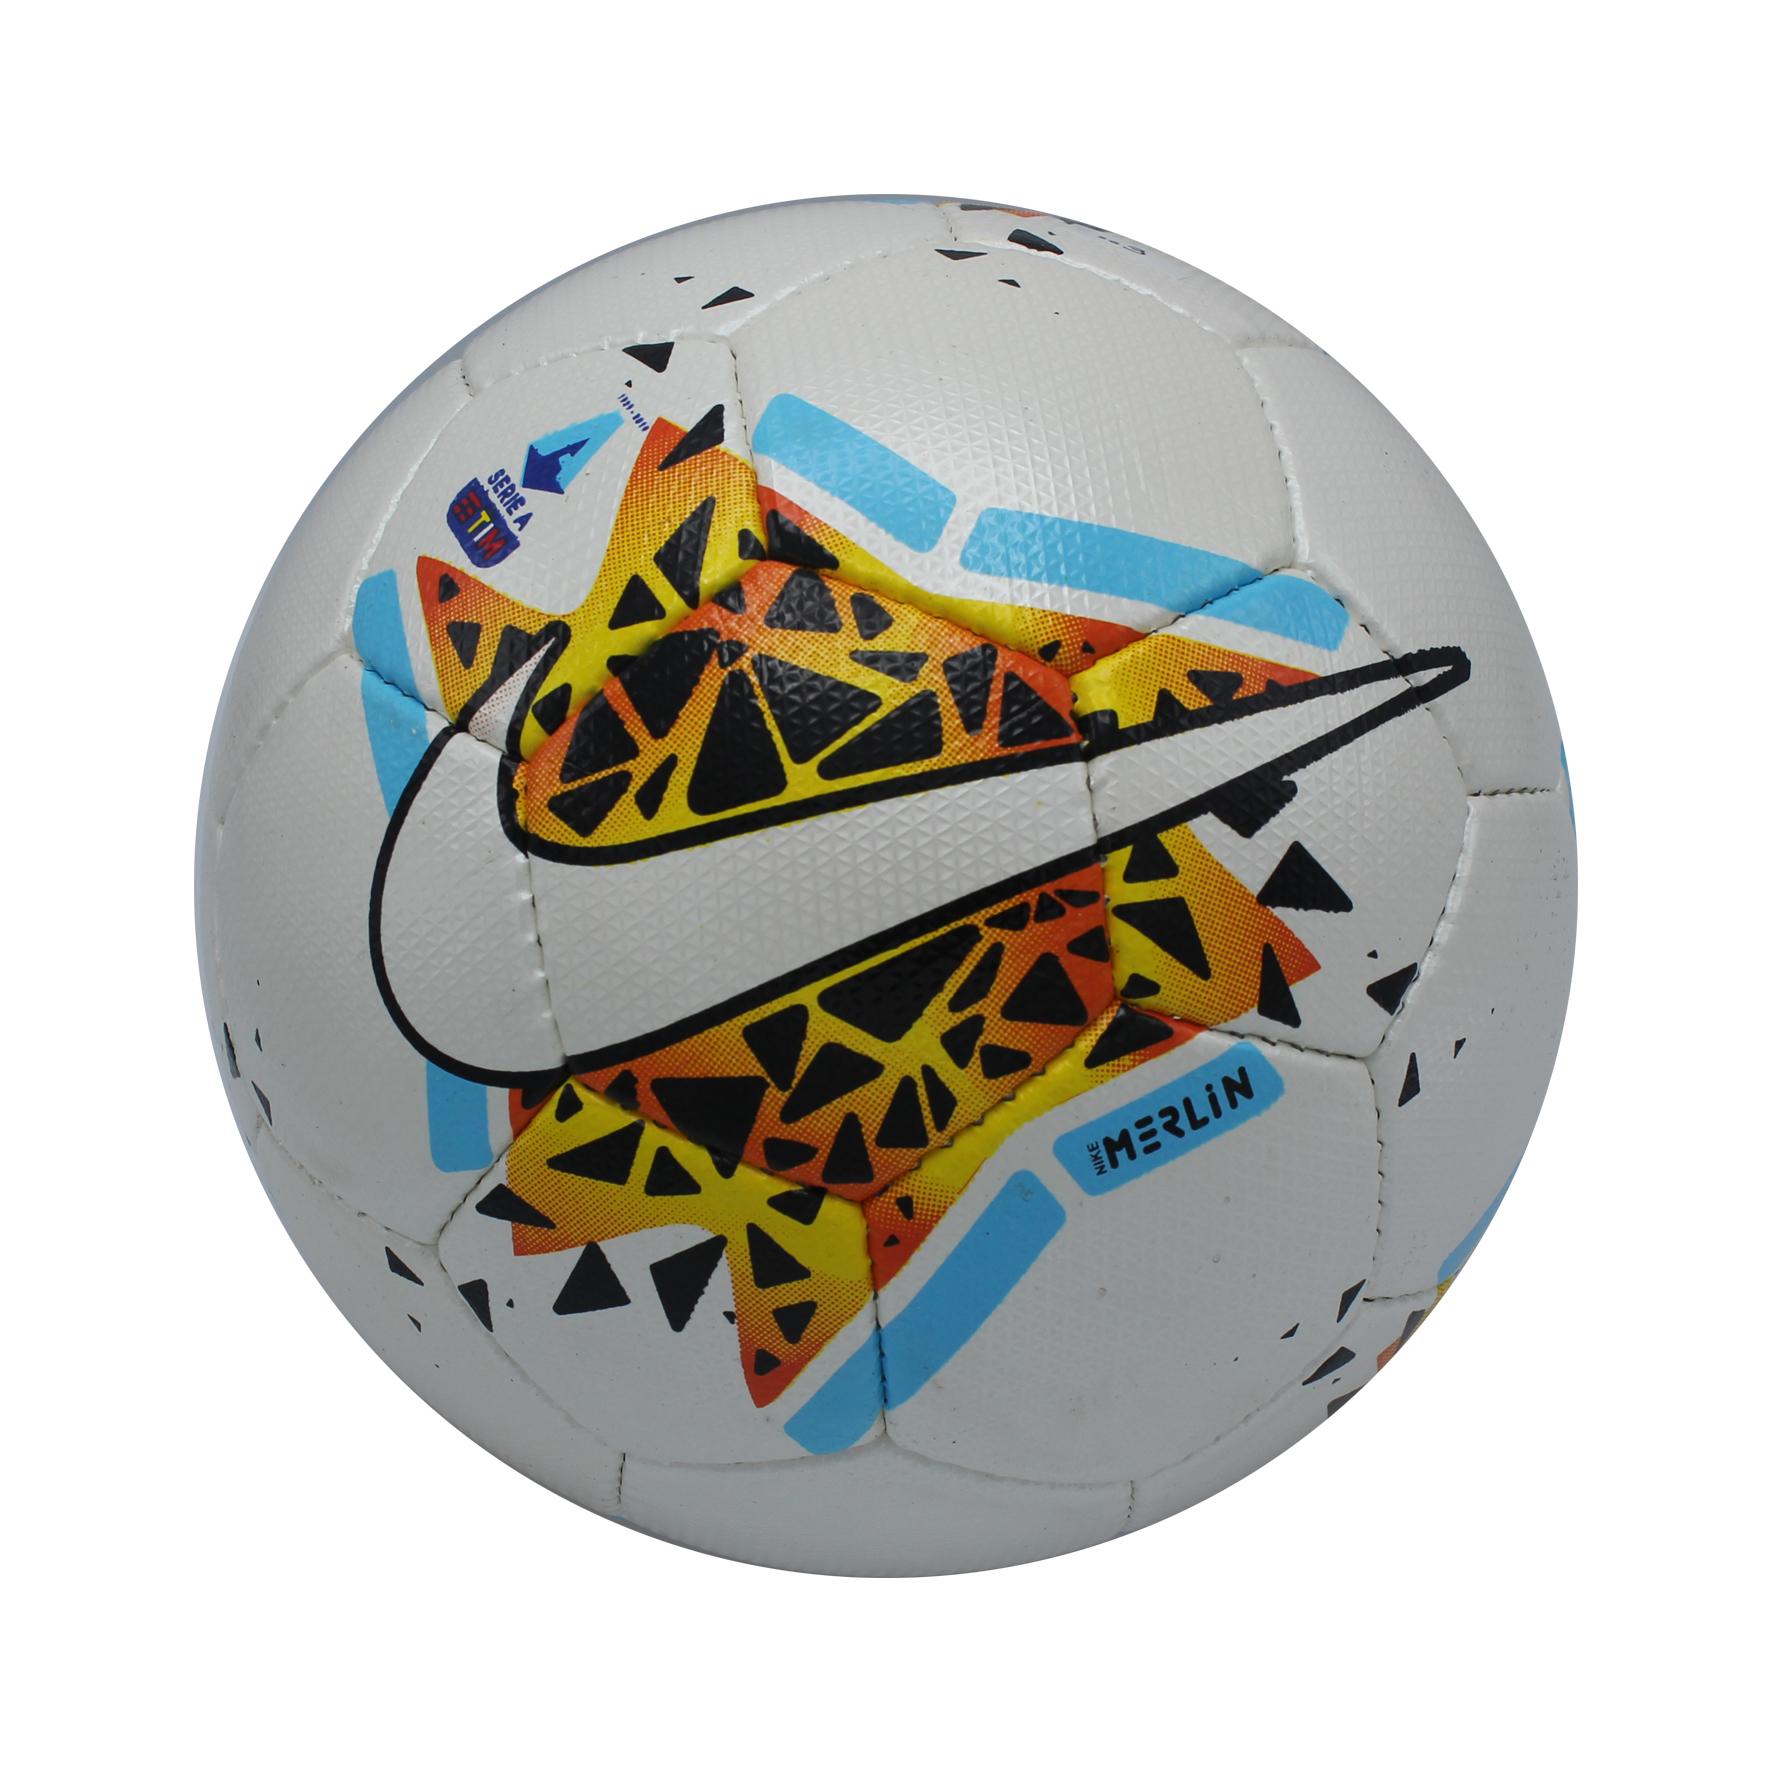 خرید                     توپ فوتبال نایکی مدل MERLIN 333